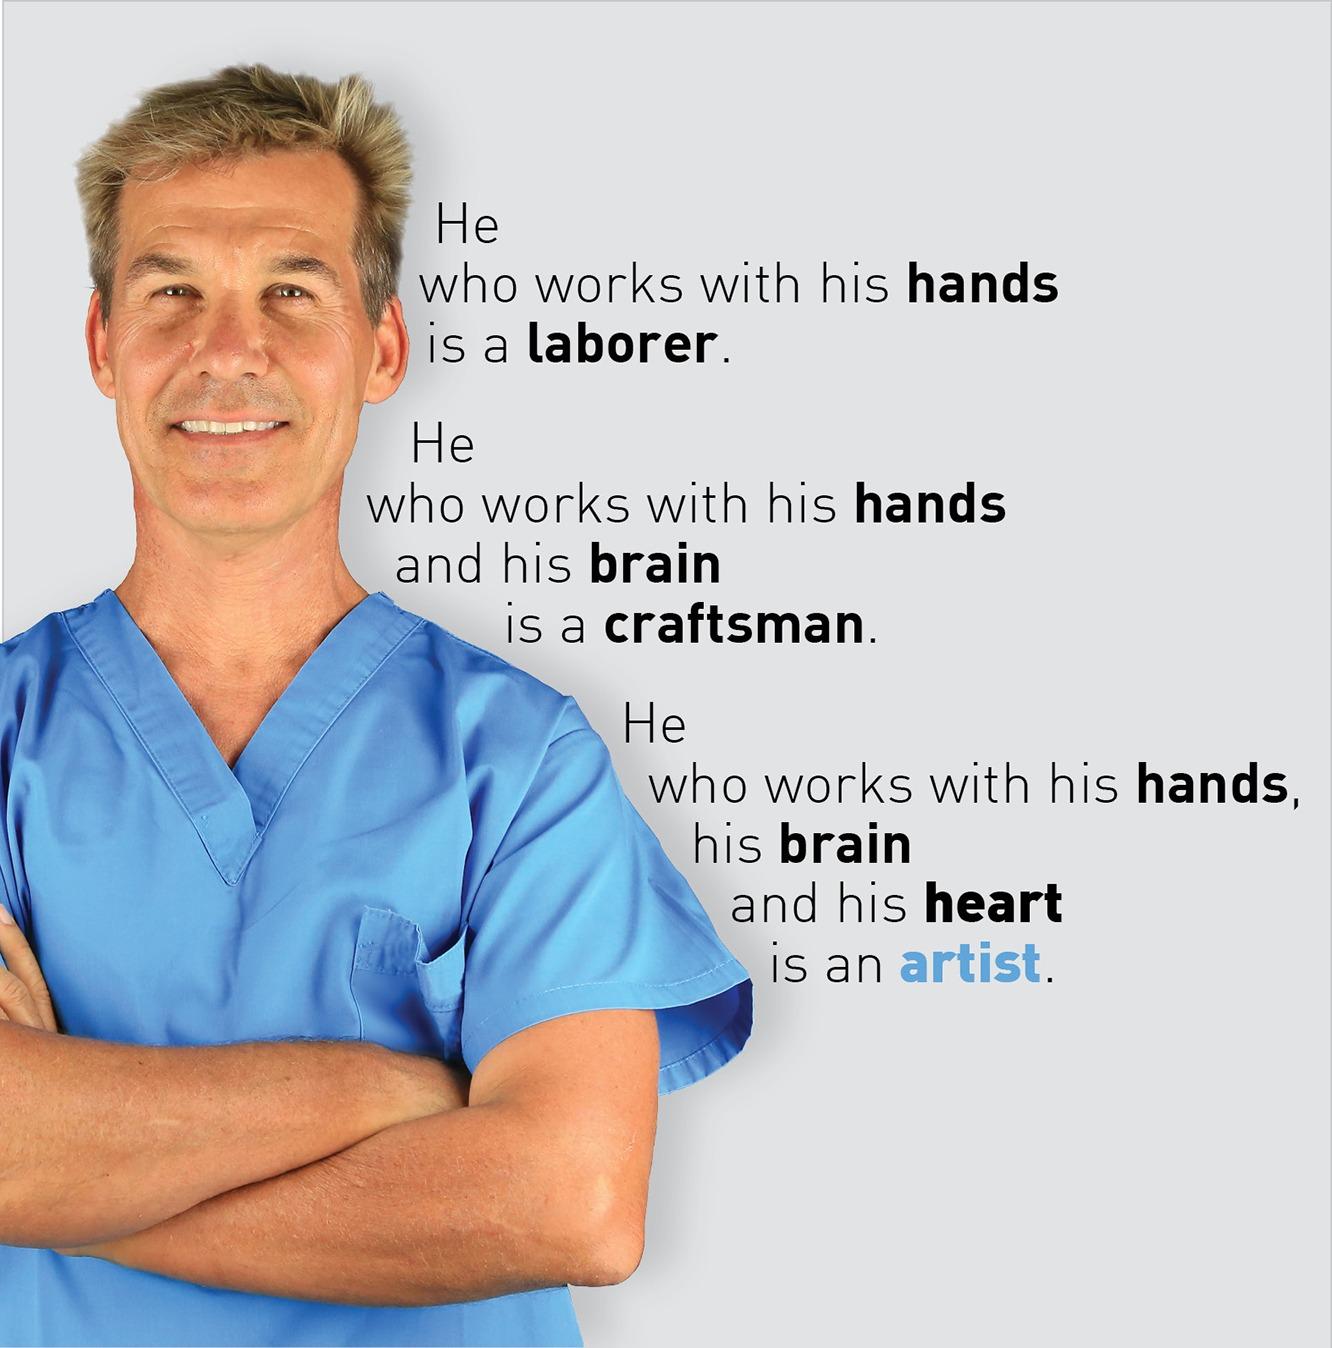 Dr. Cris Piessens crafter